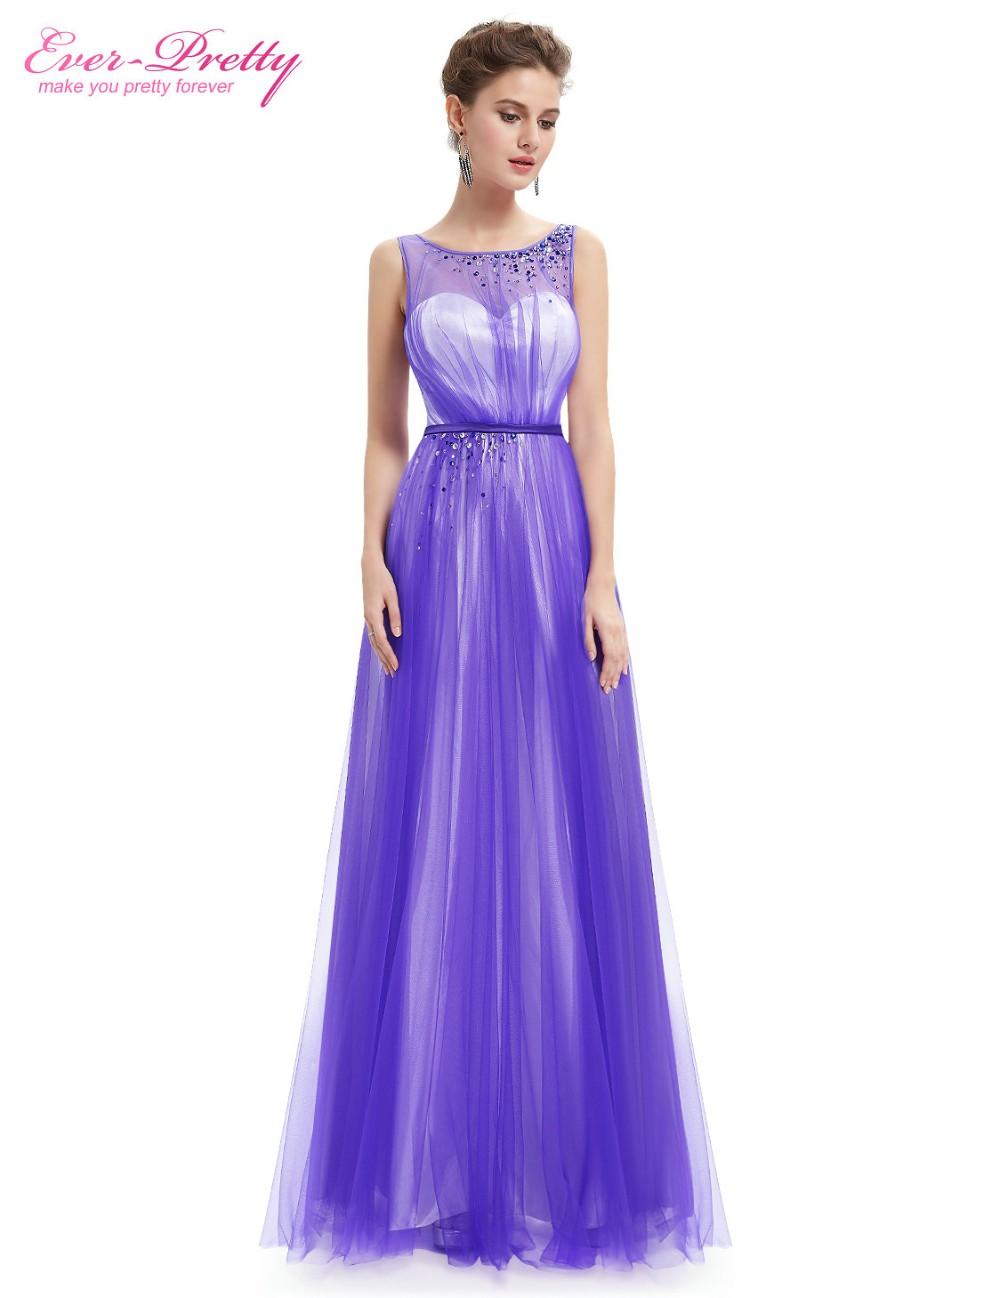 14d624494418c [Clearance Sale] Elegant Ever Pretty Evening Dresses He08747 Women Round  Neck Sleeveless Long